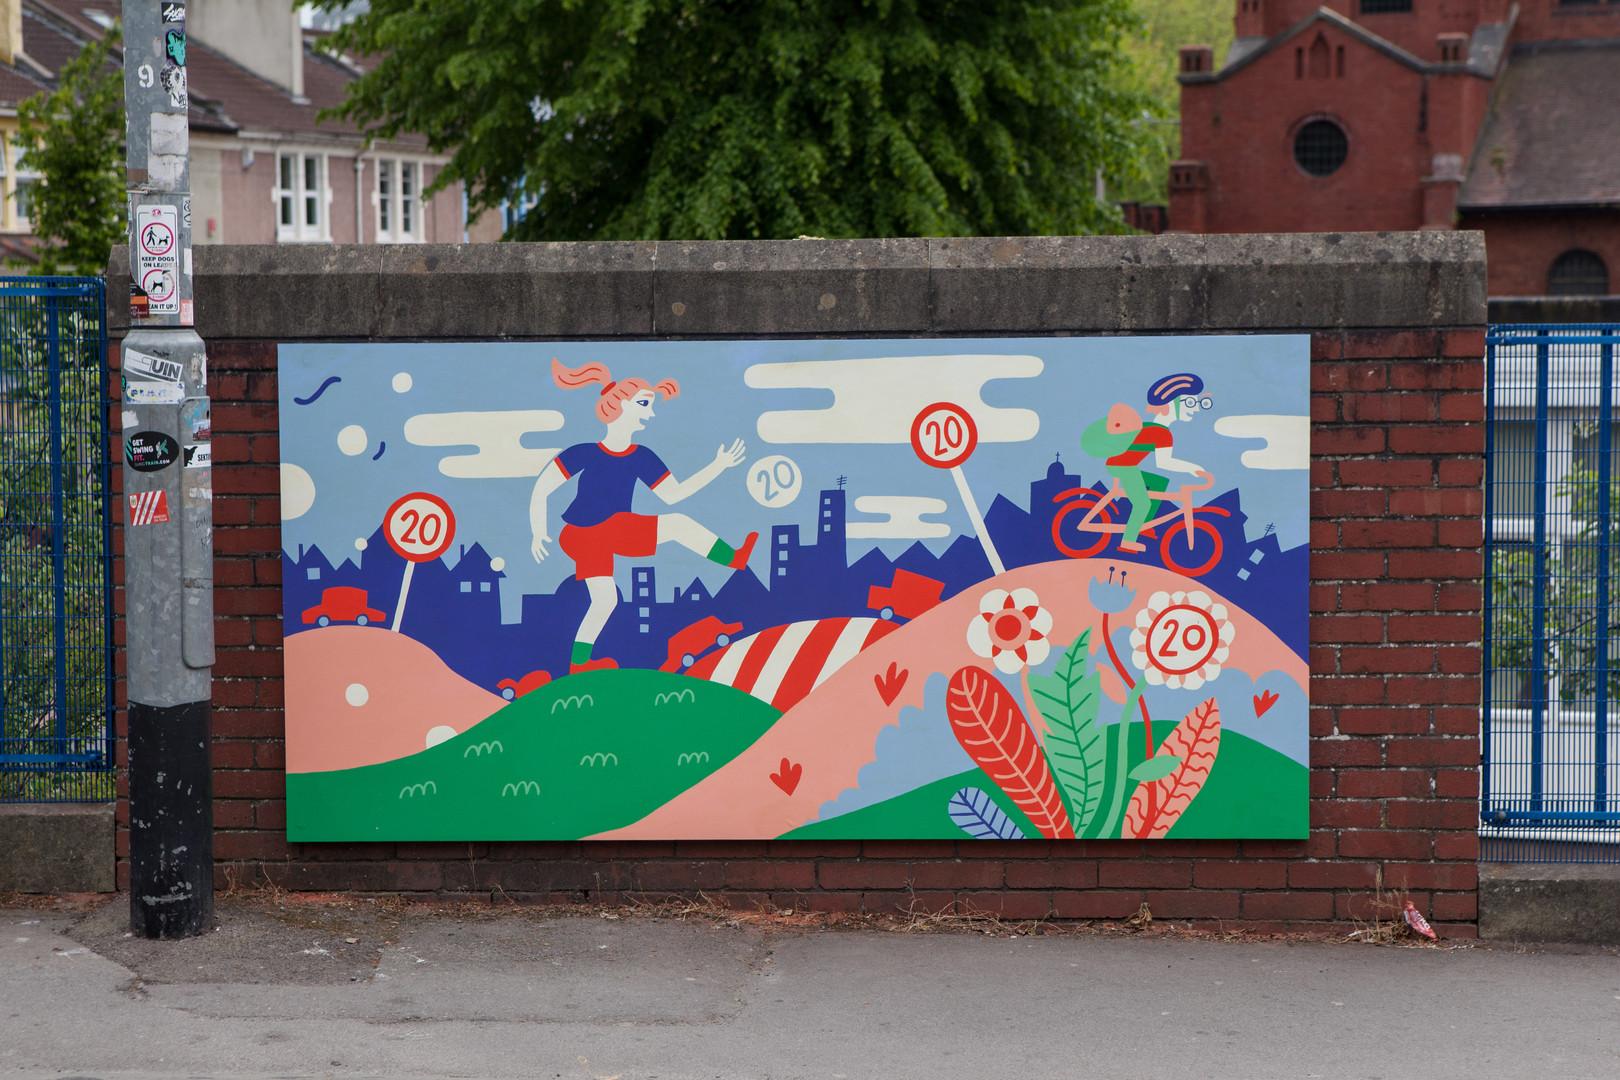 20mph School Mural